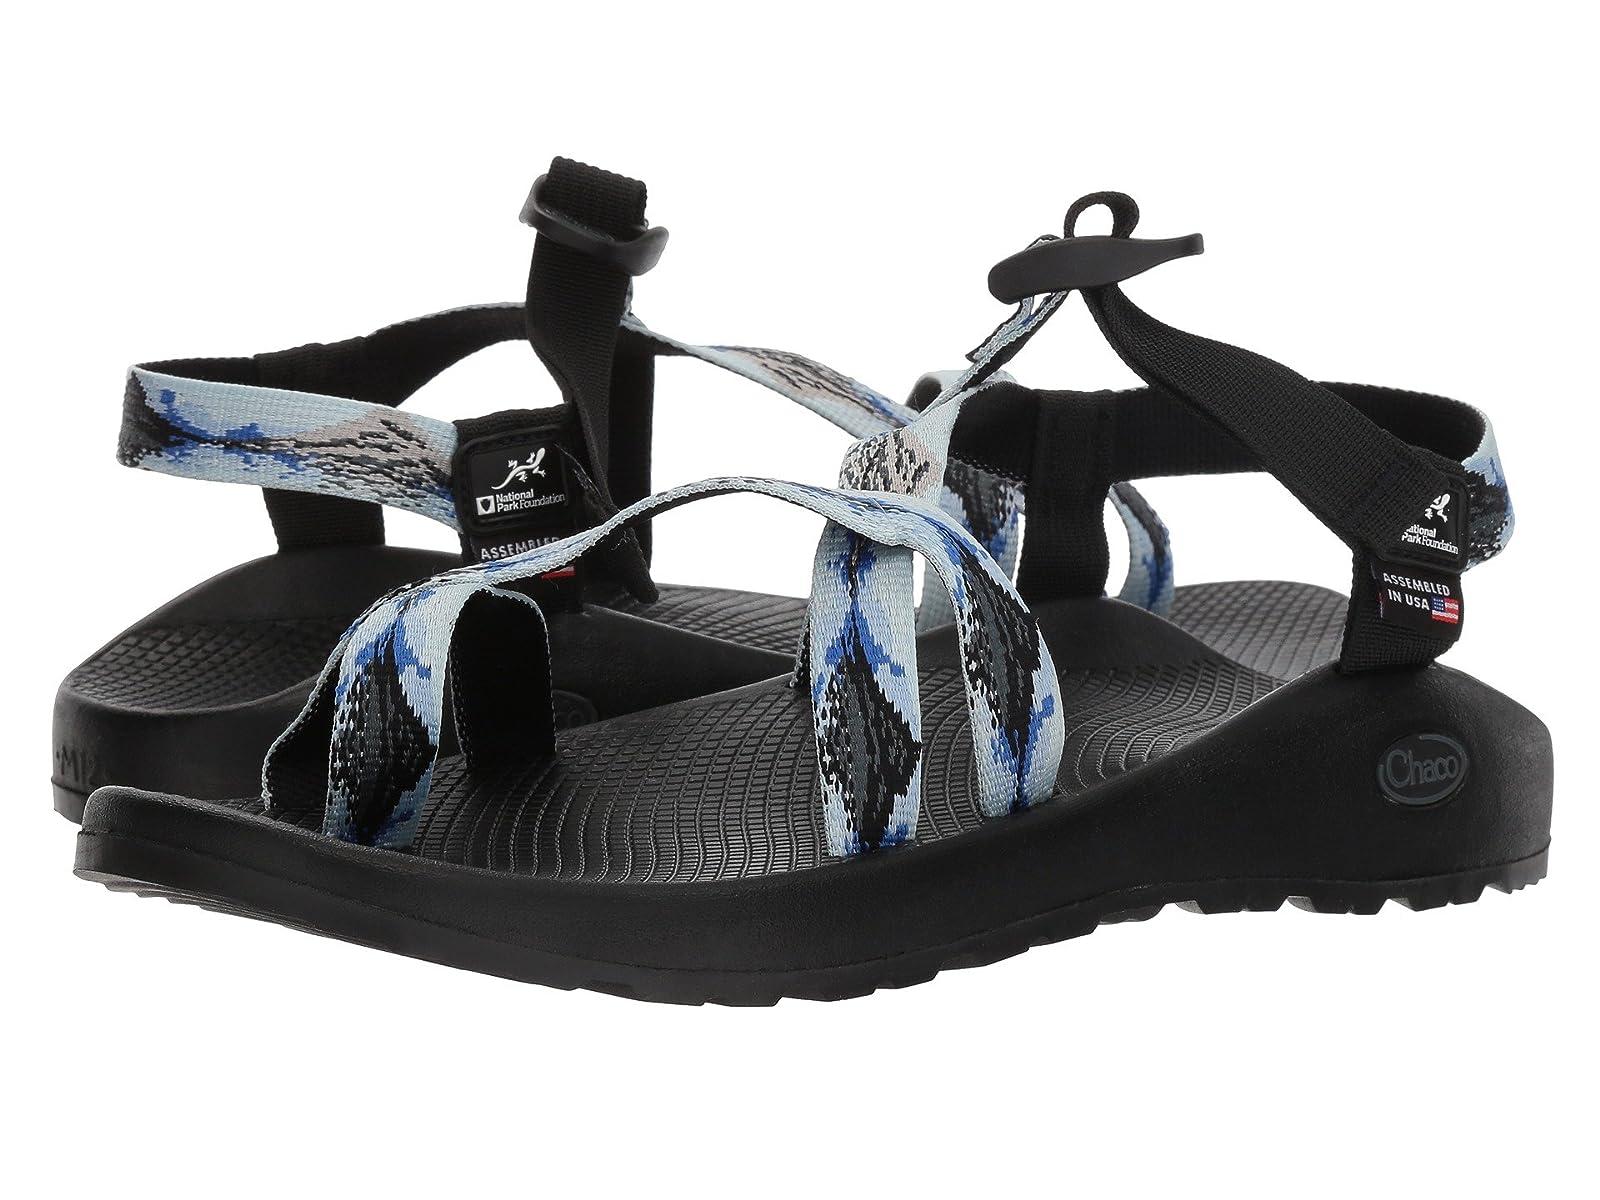 Chaco Z/2® NPF GlacierComfortable and distinctive shoes